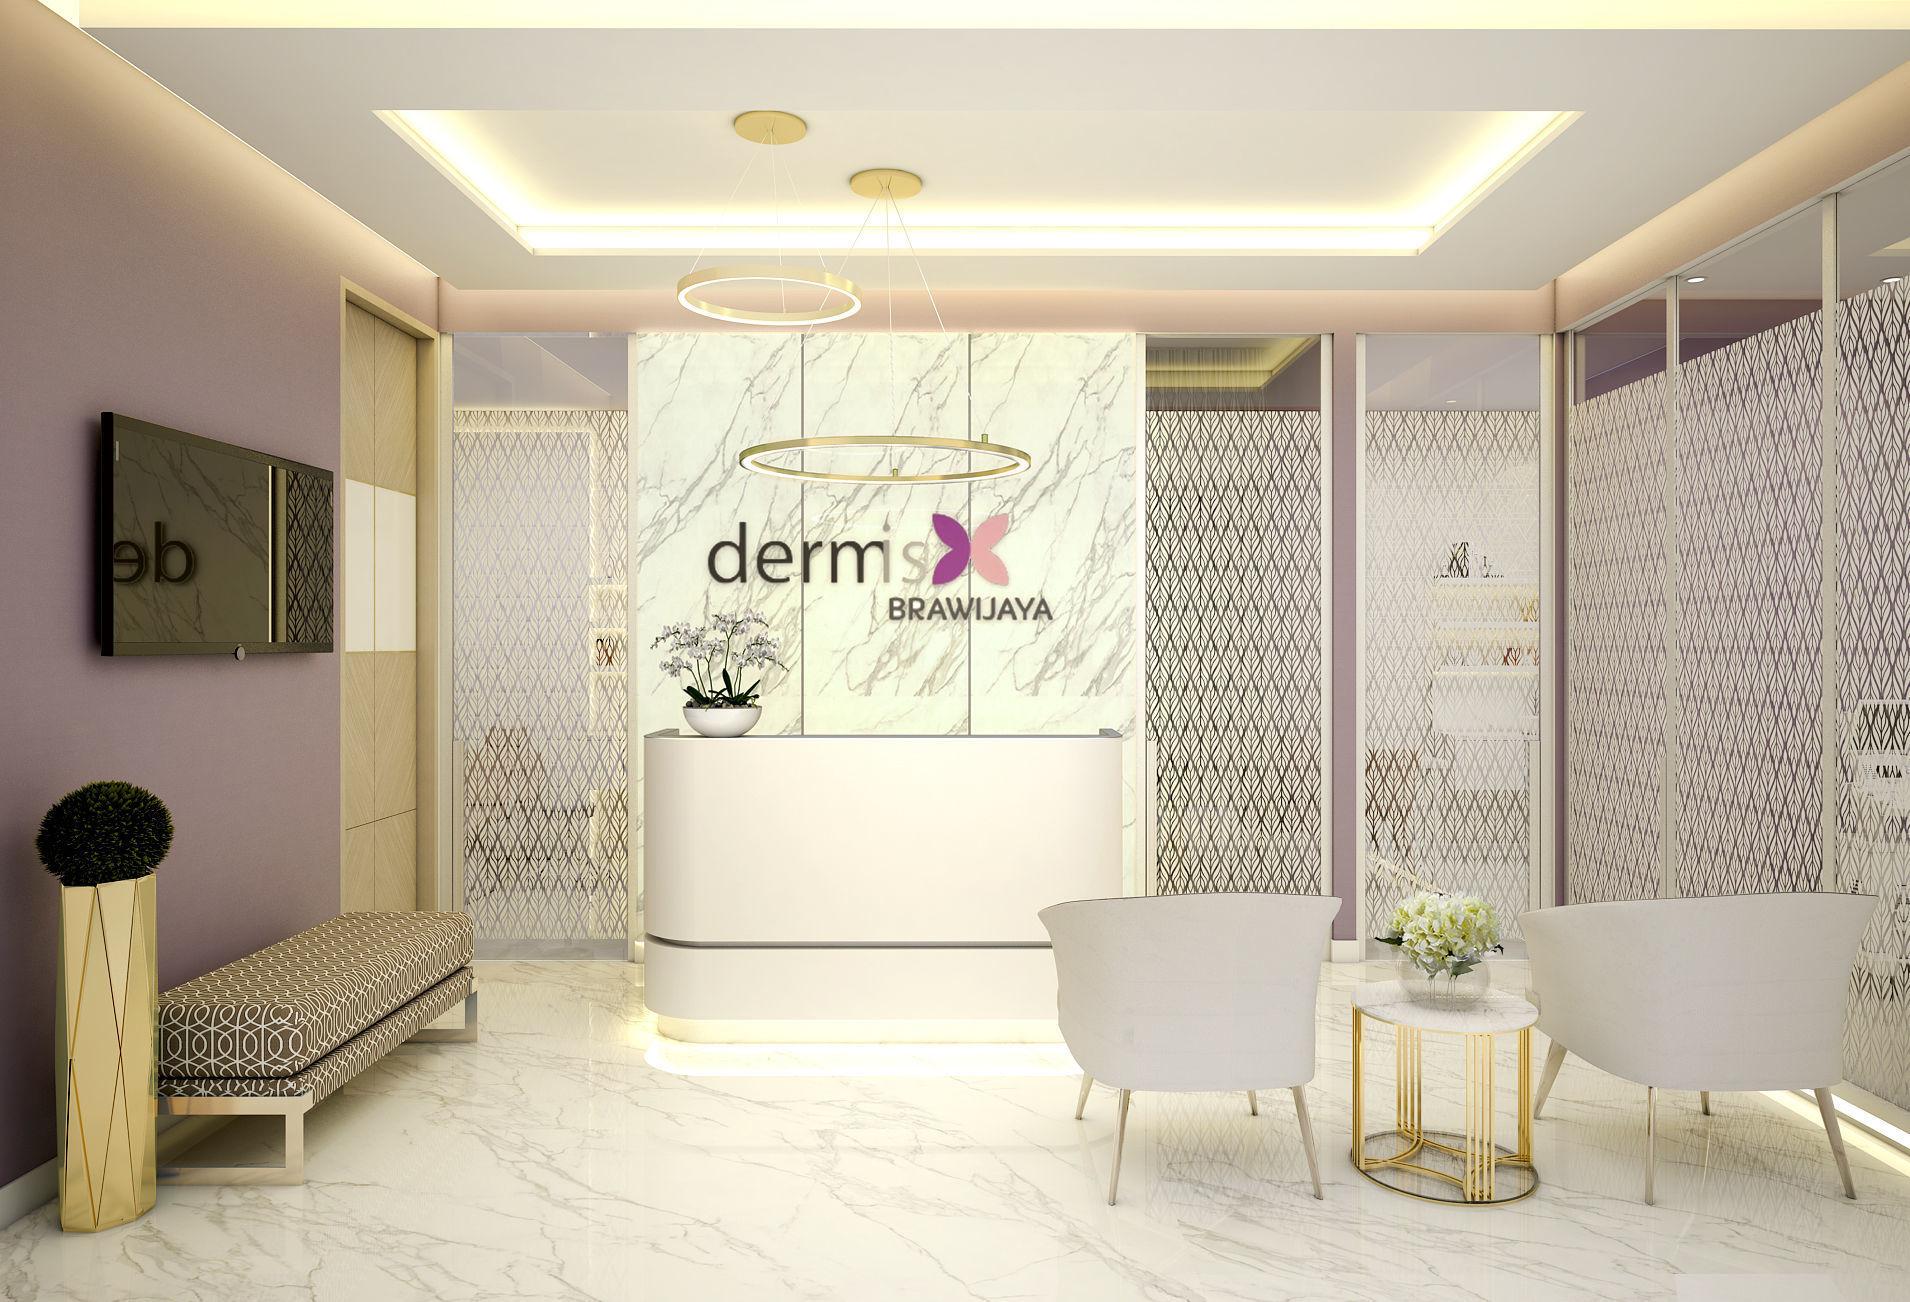 Beauty Clinic Dermis Brawijaya